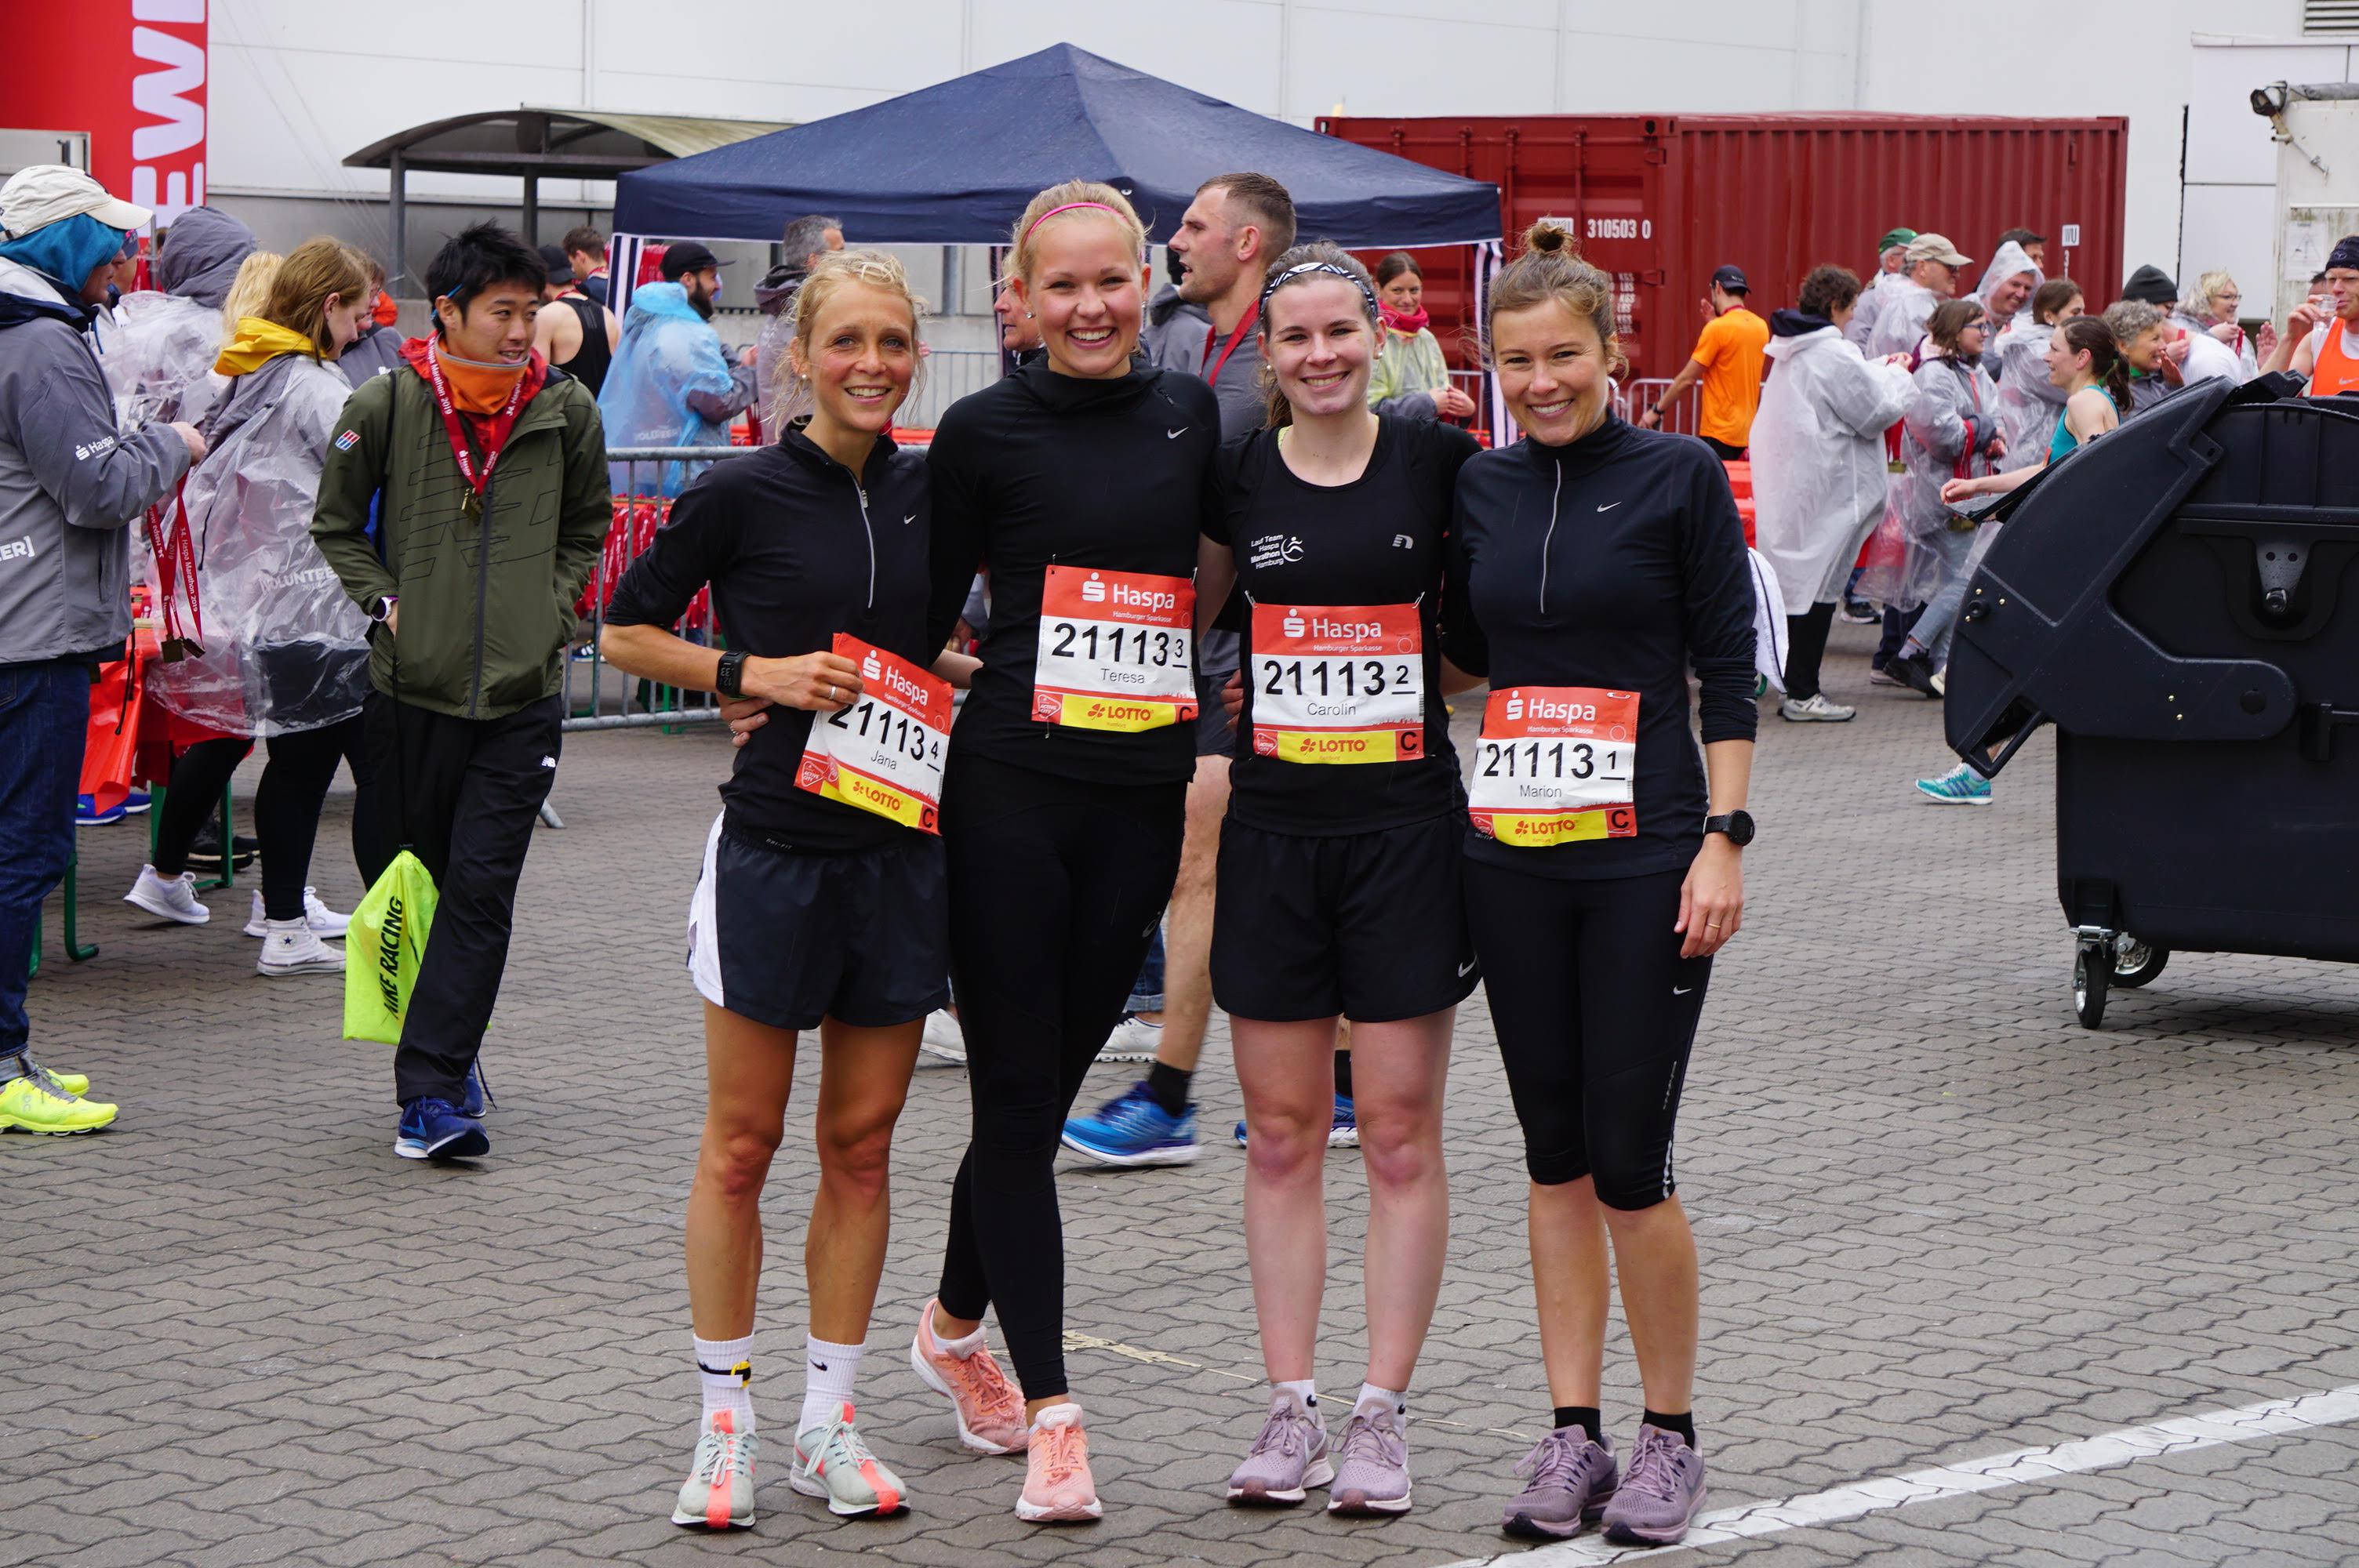 Laufteam Haspa Marathon Hamburg